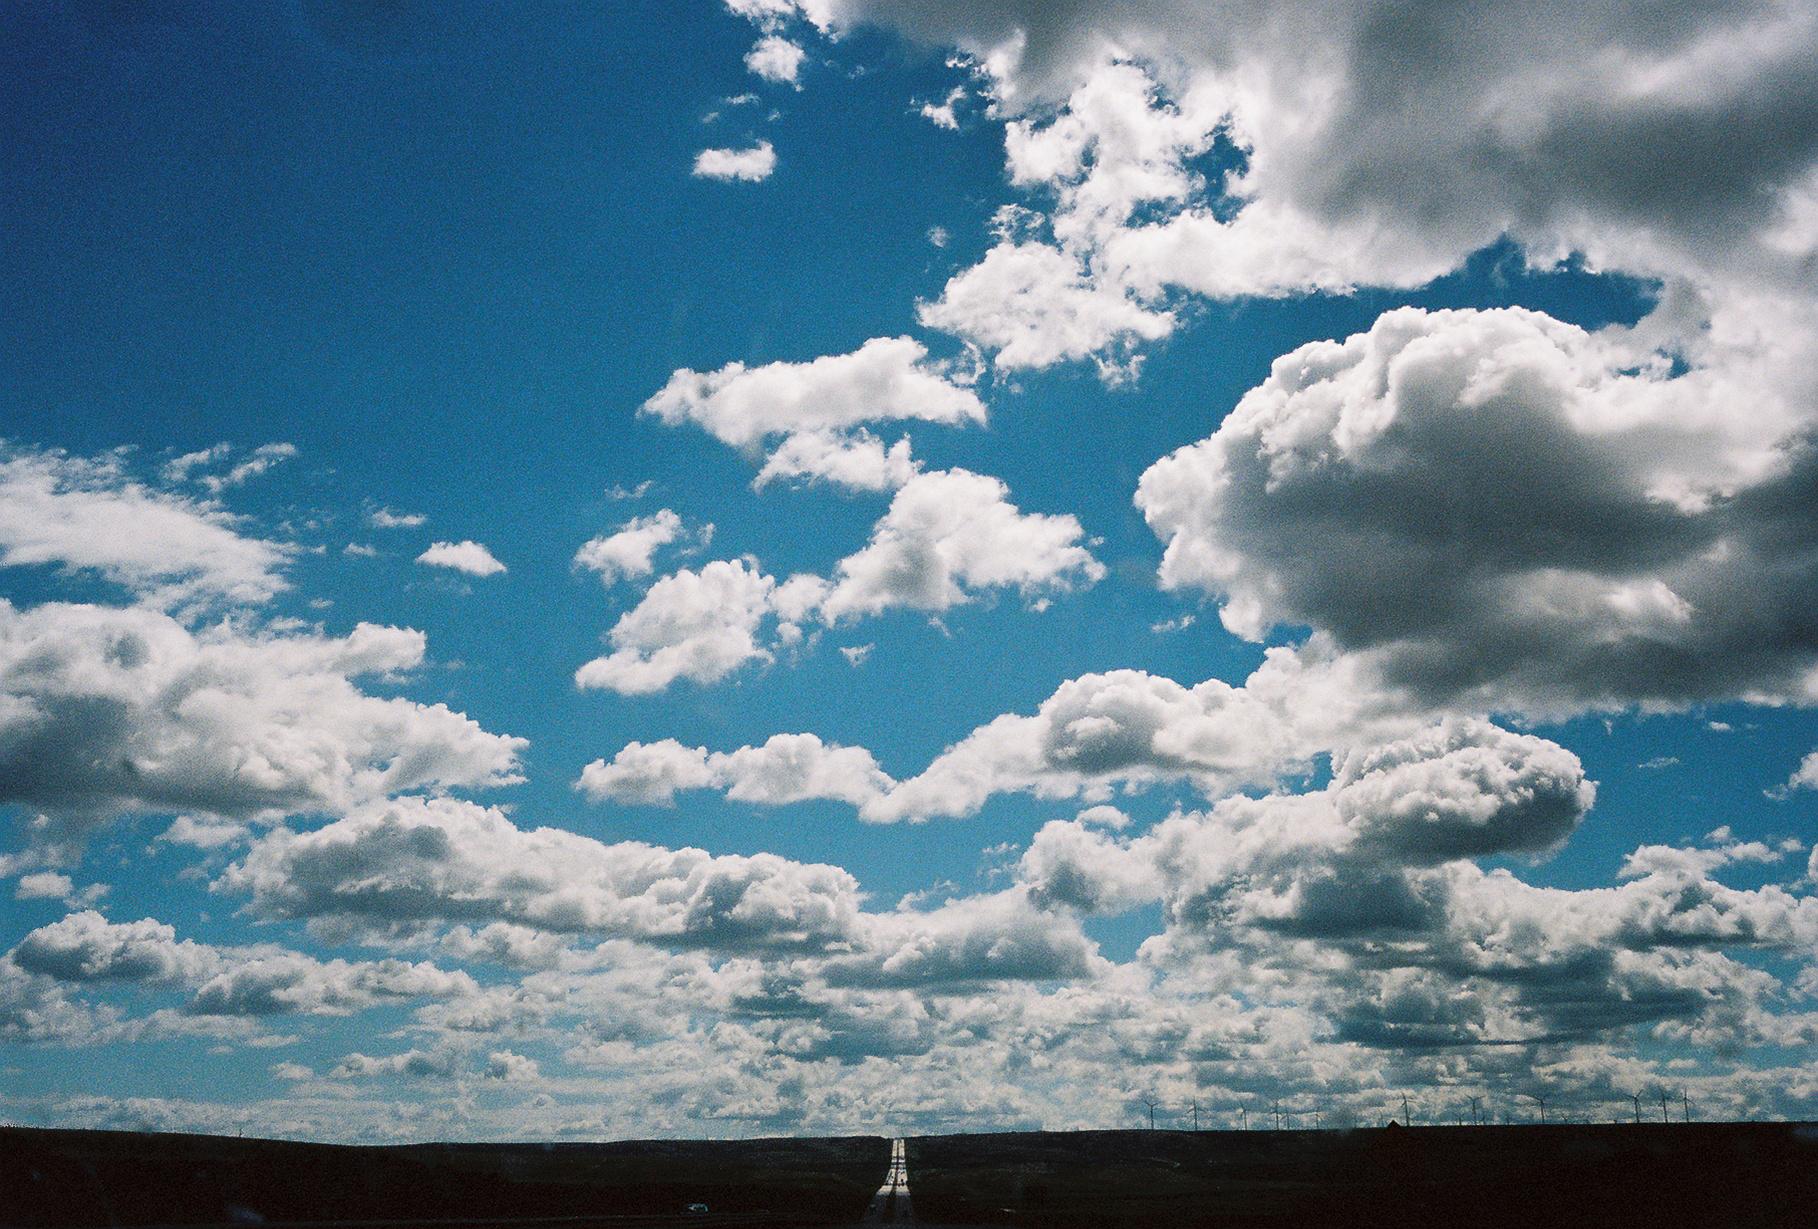 wyoming sky.jpg